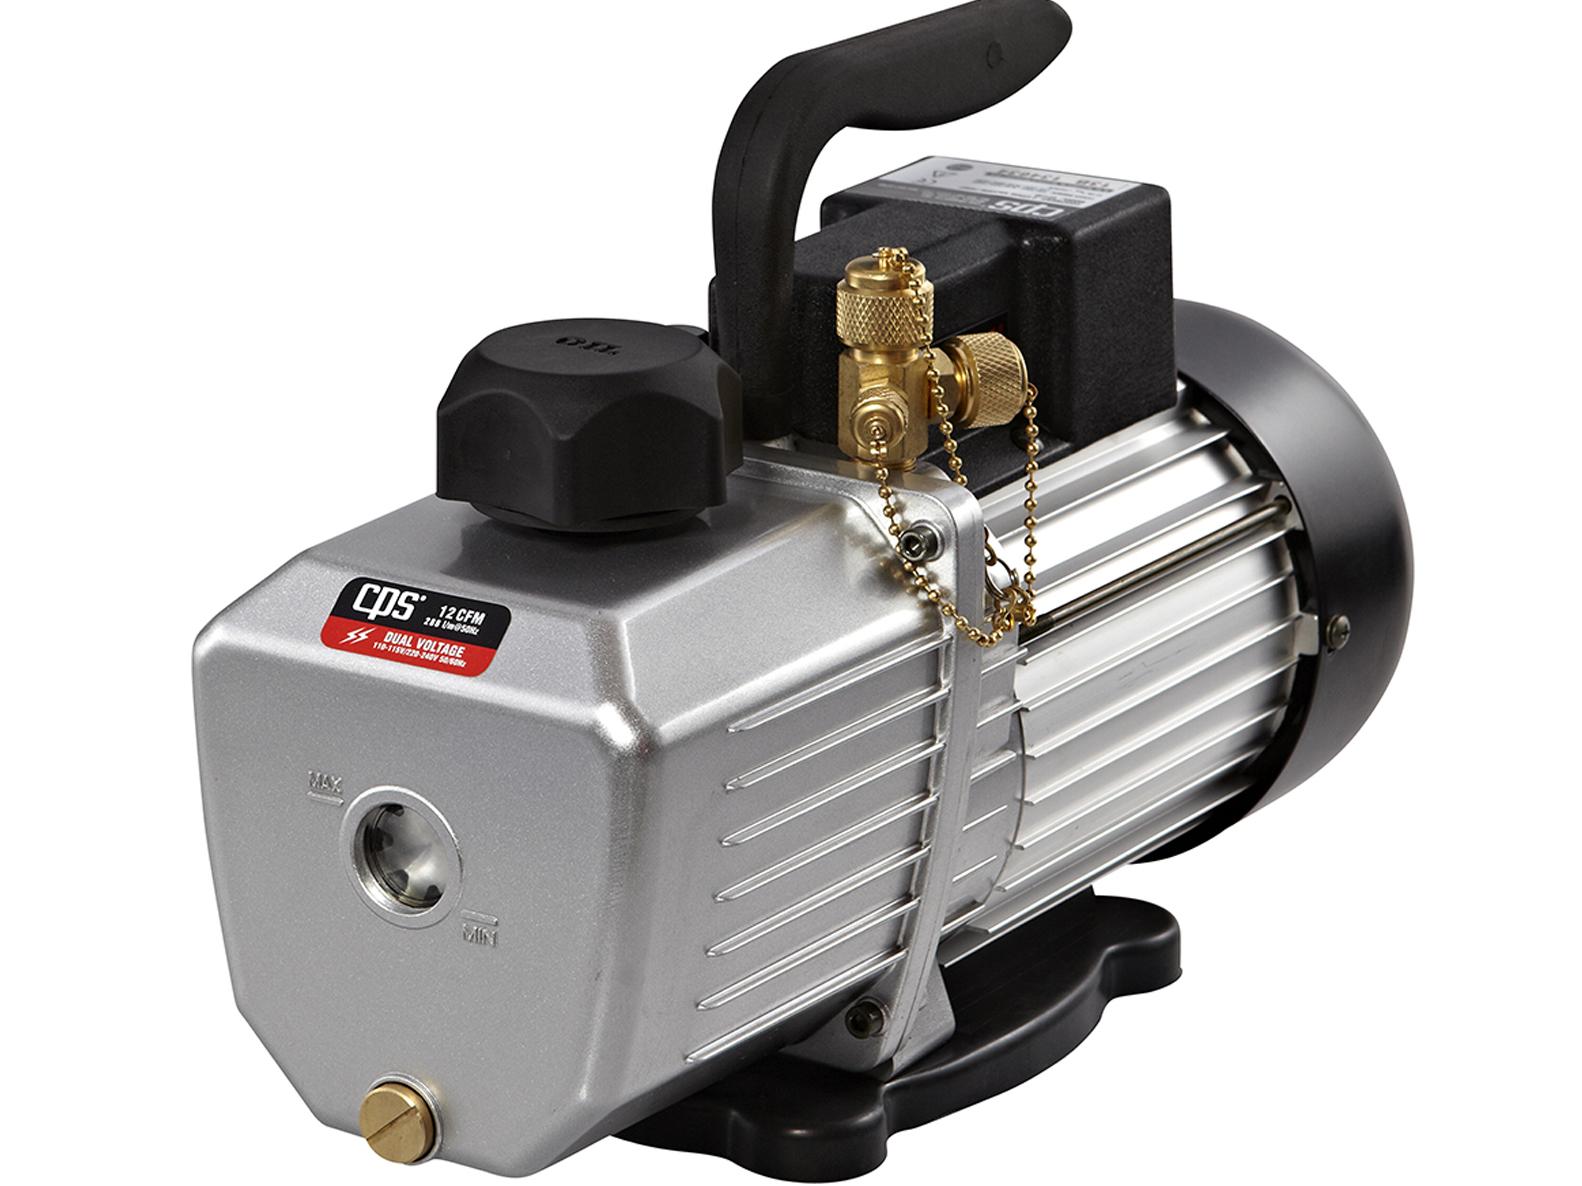 VP12D | Pro-Set® 12 CFM Vacuum Pump - CPS Products Inc